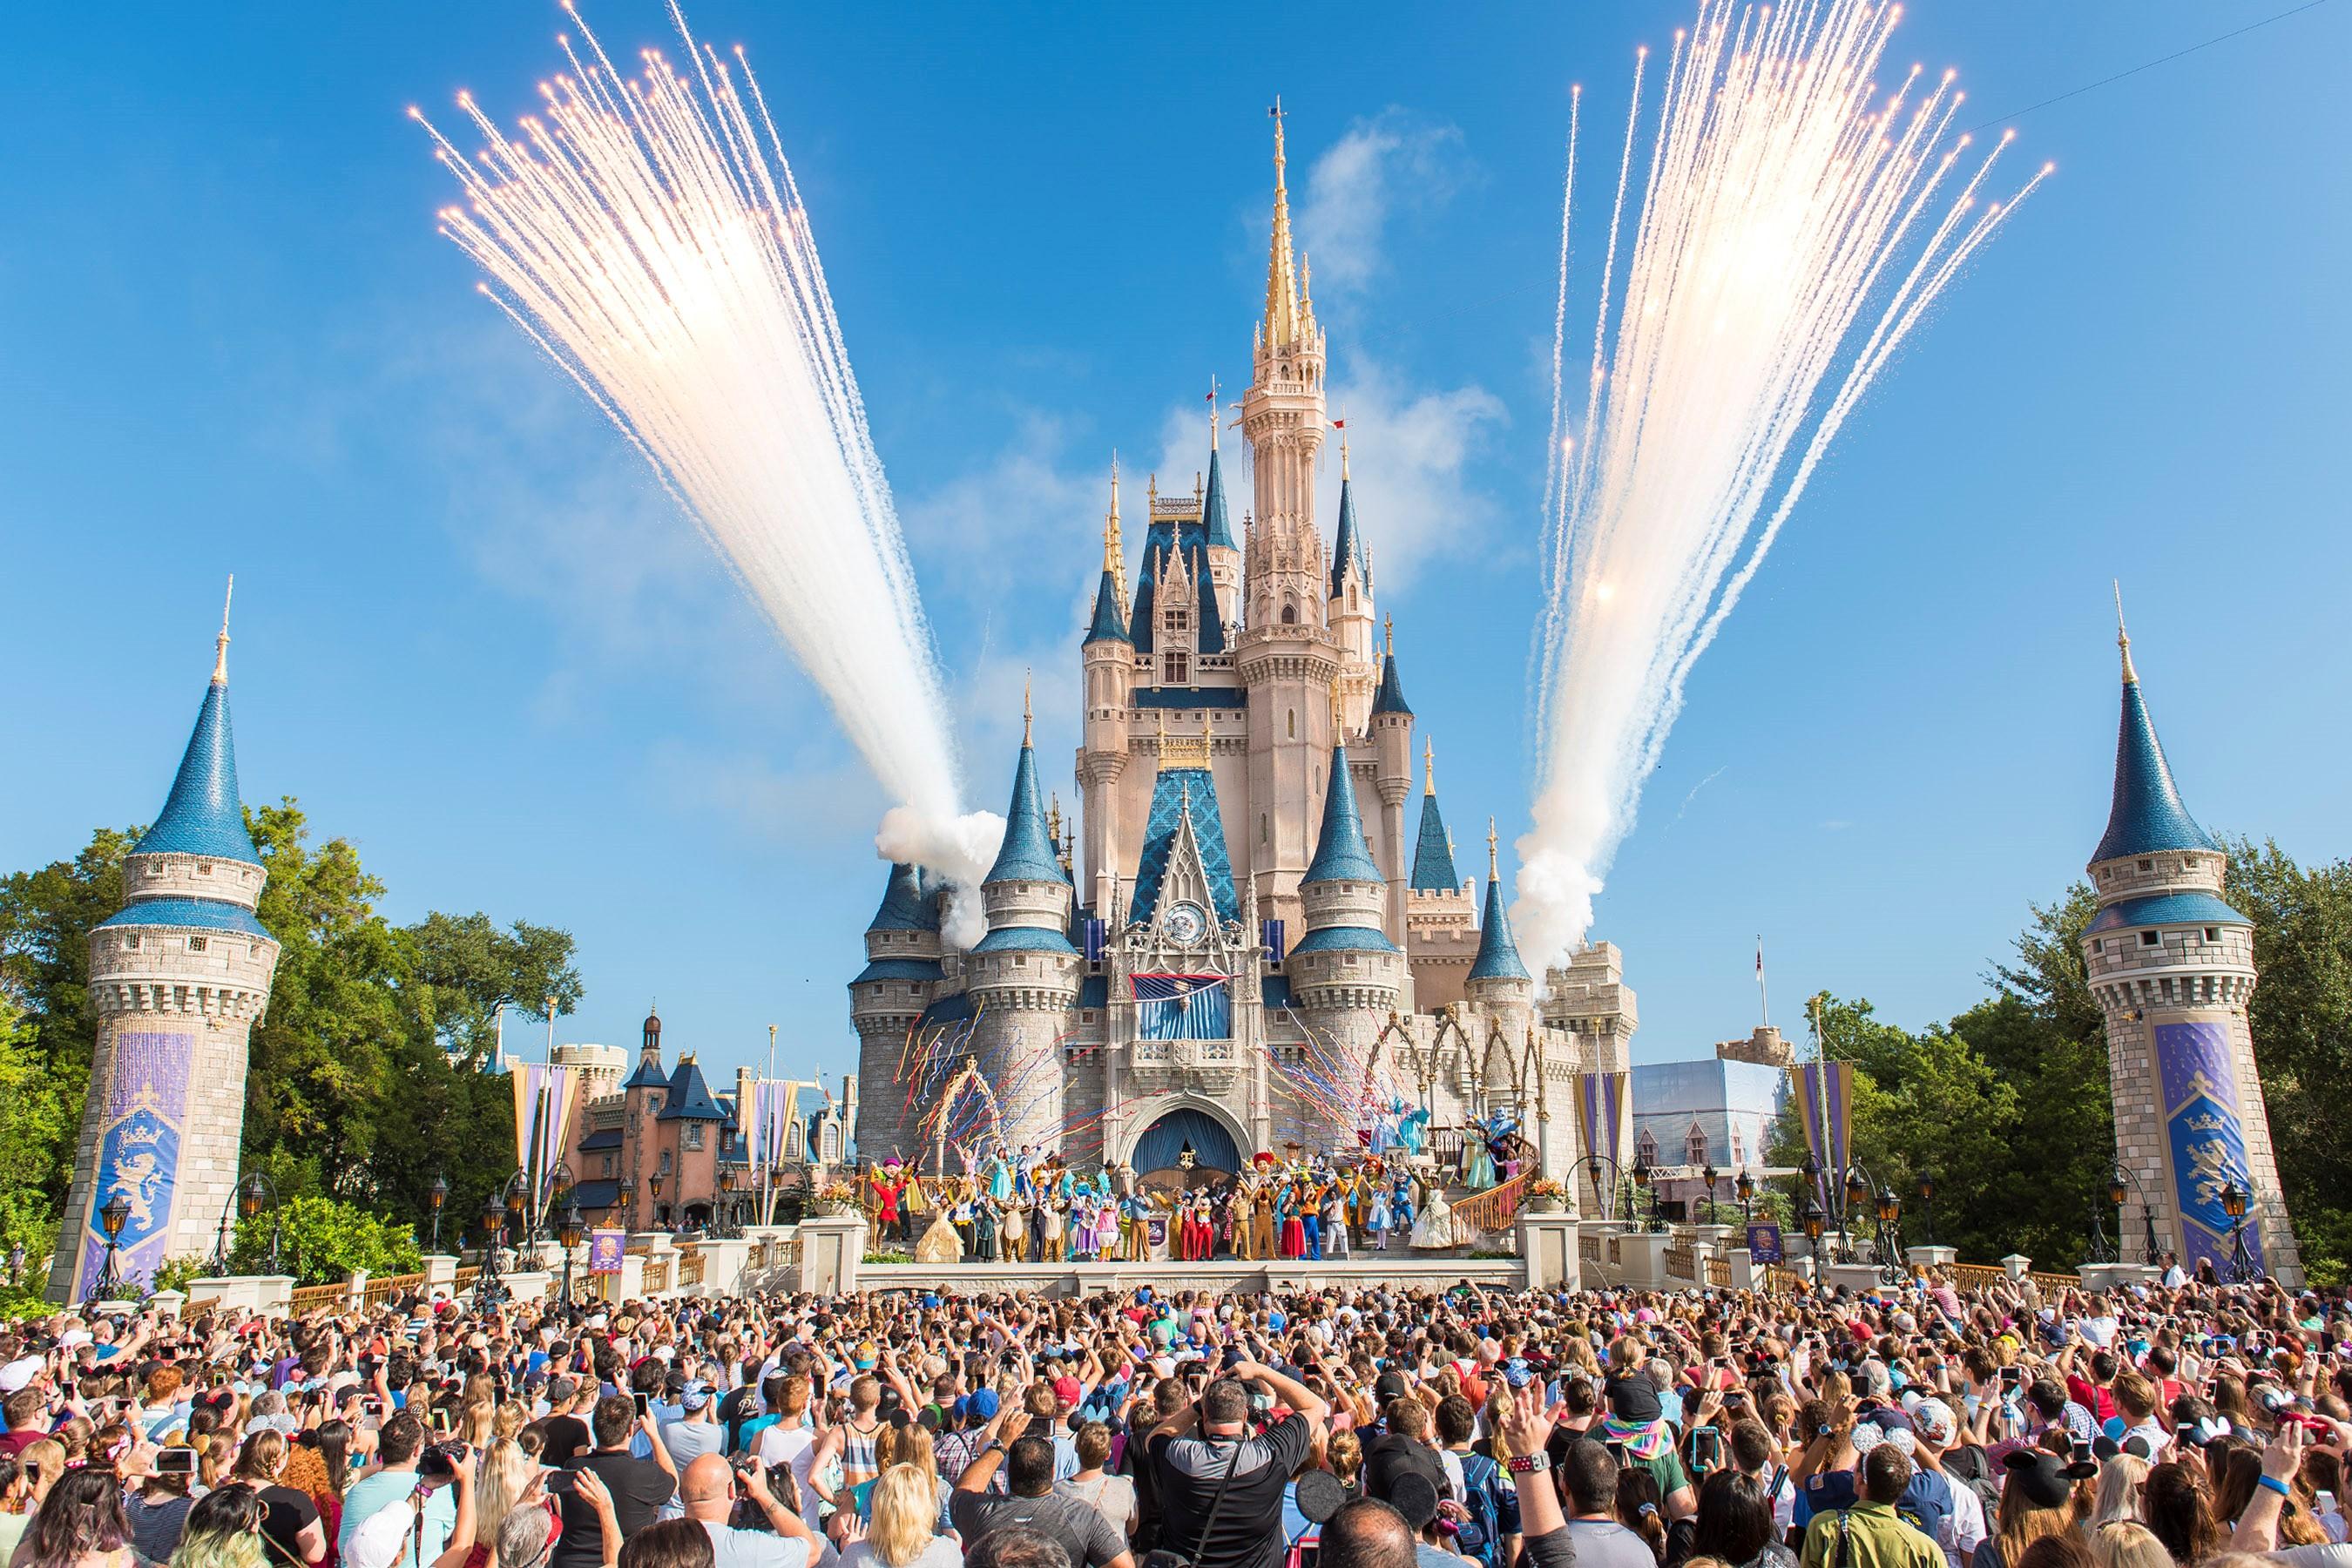 fox8.com - Natasha Anderson - Walt Disney World resuming park ticket sales, resort hotel bookings tomorrow